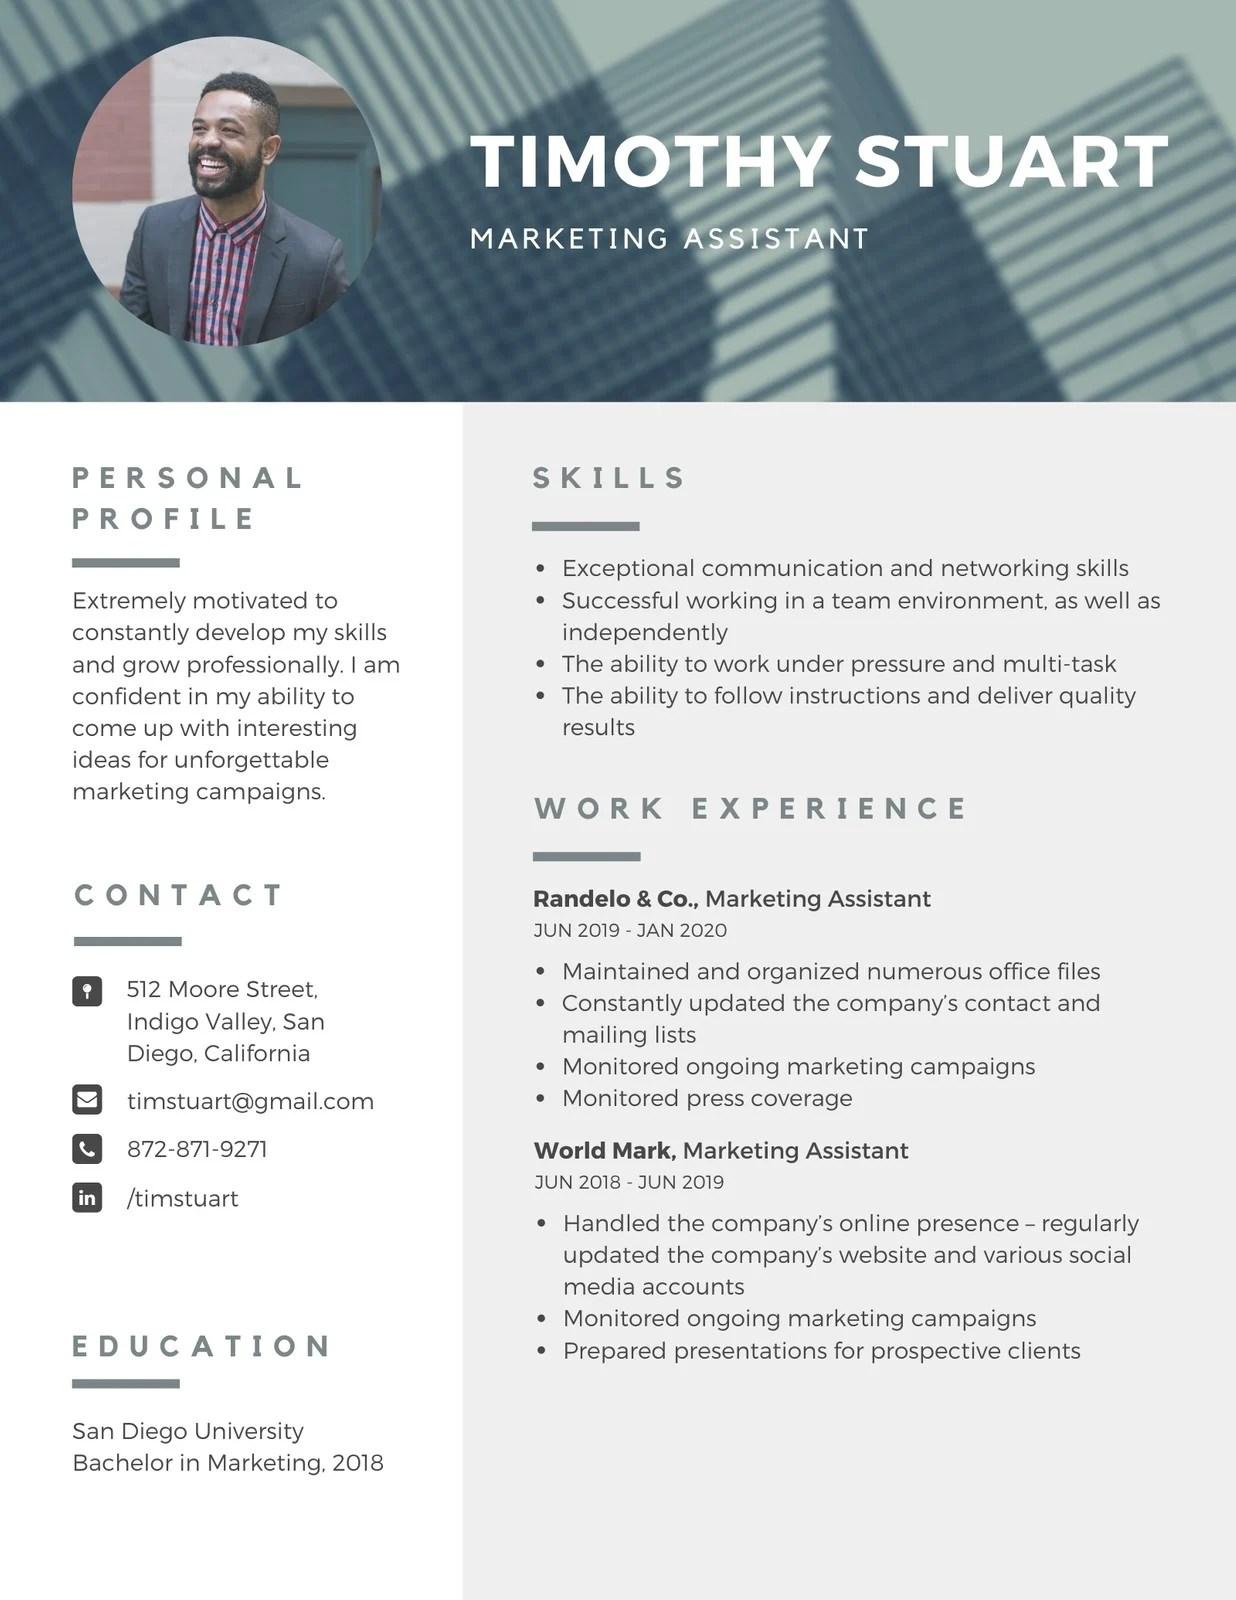 The feminine resume, a free template for microsoft word. Free Printable Customizable Minimalist Resume Templates Canva